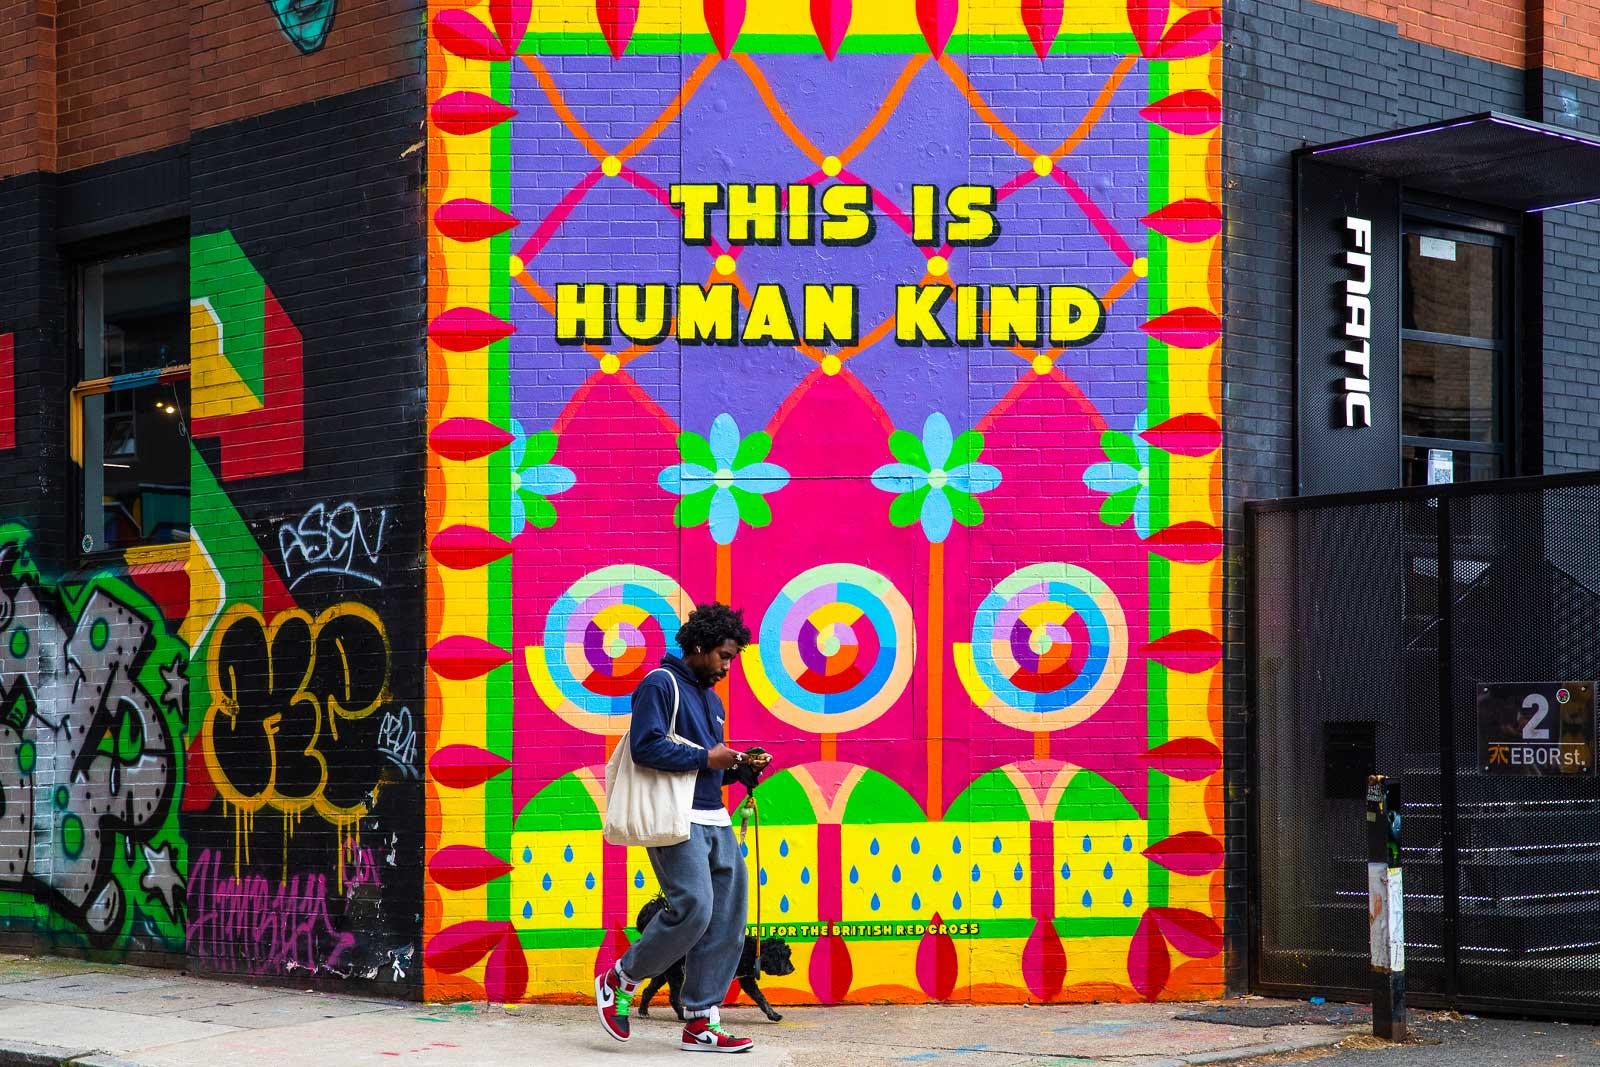 British Red Cross and Yinka Ilori: This is Human Kind